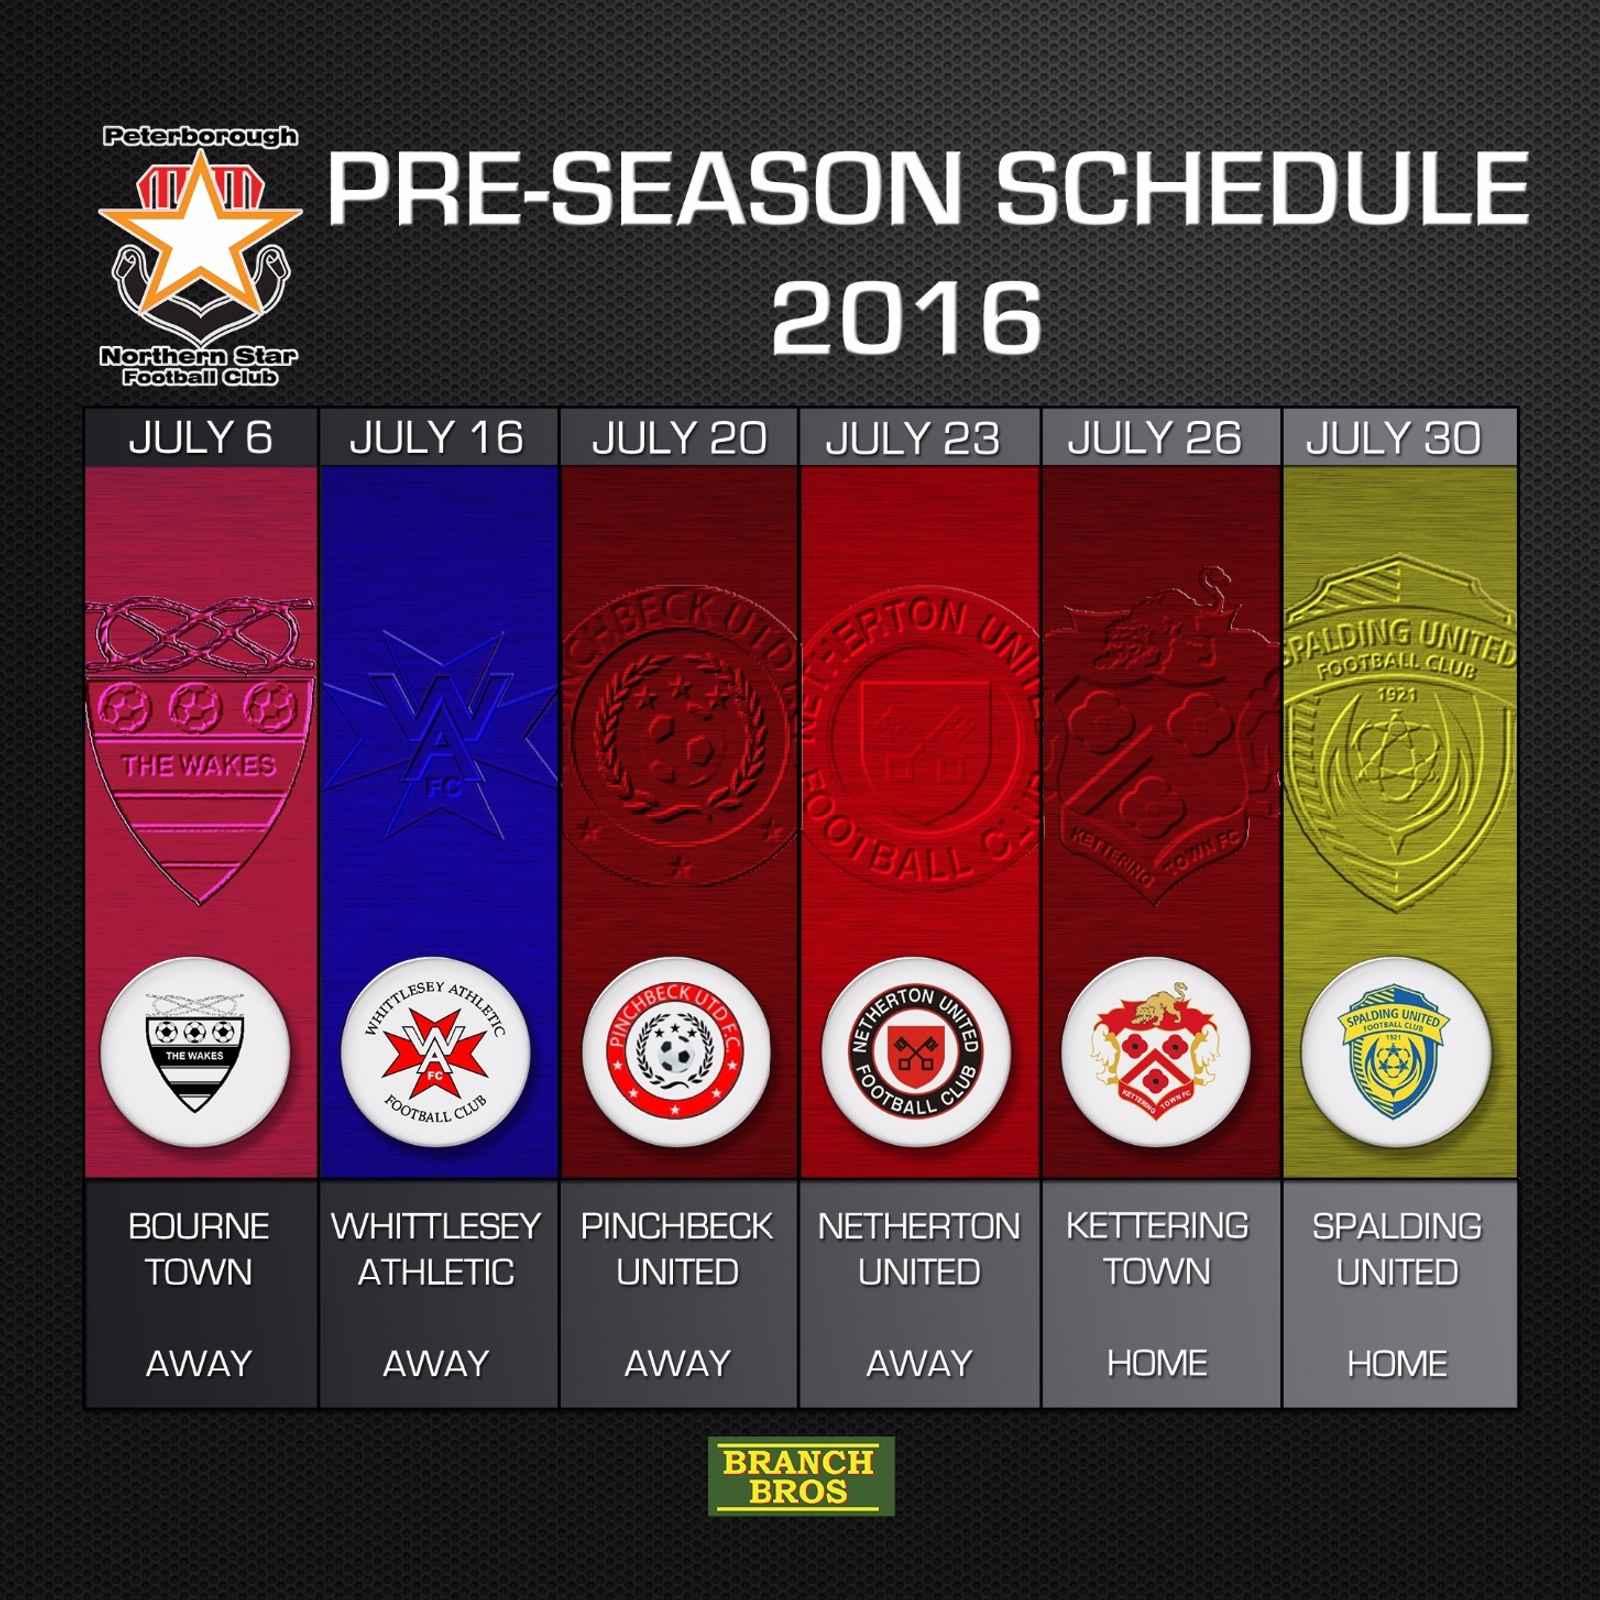 Star announce Pre-Season fixtures for 2016